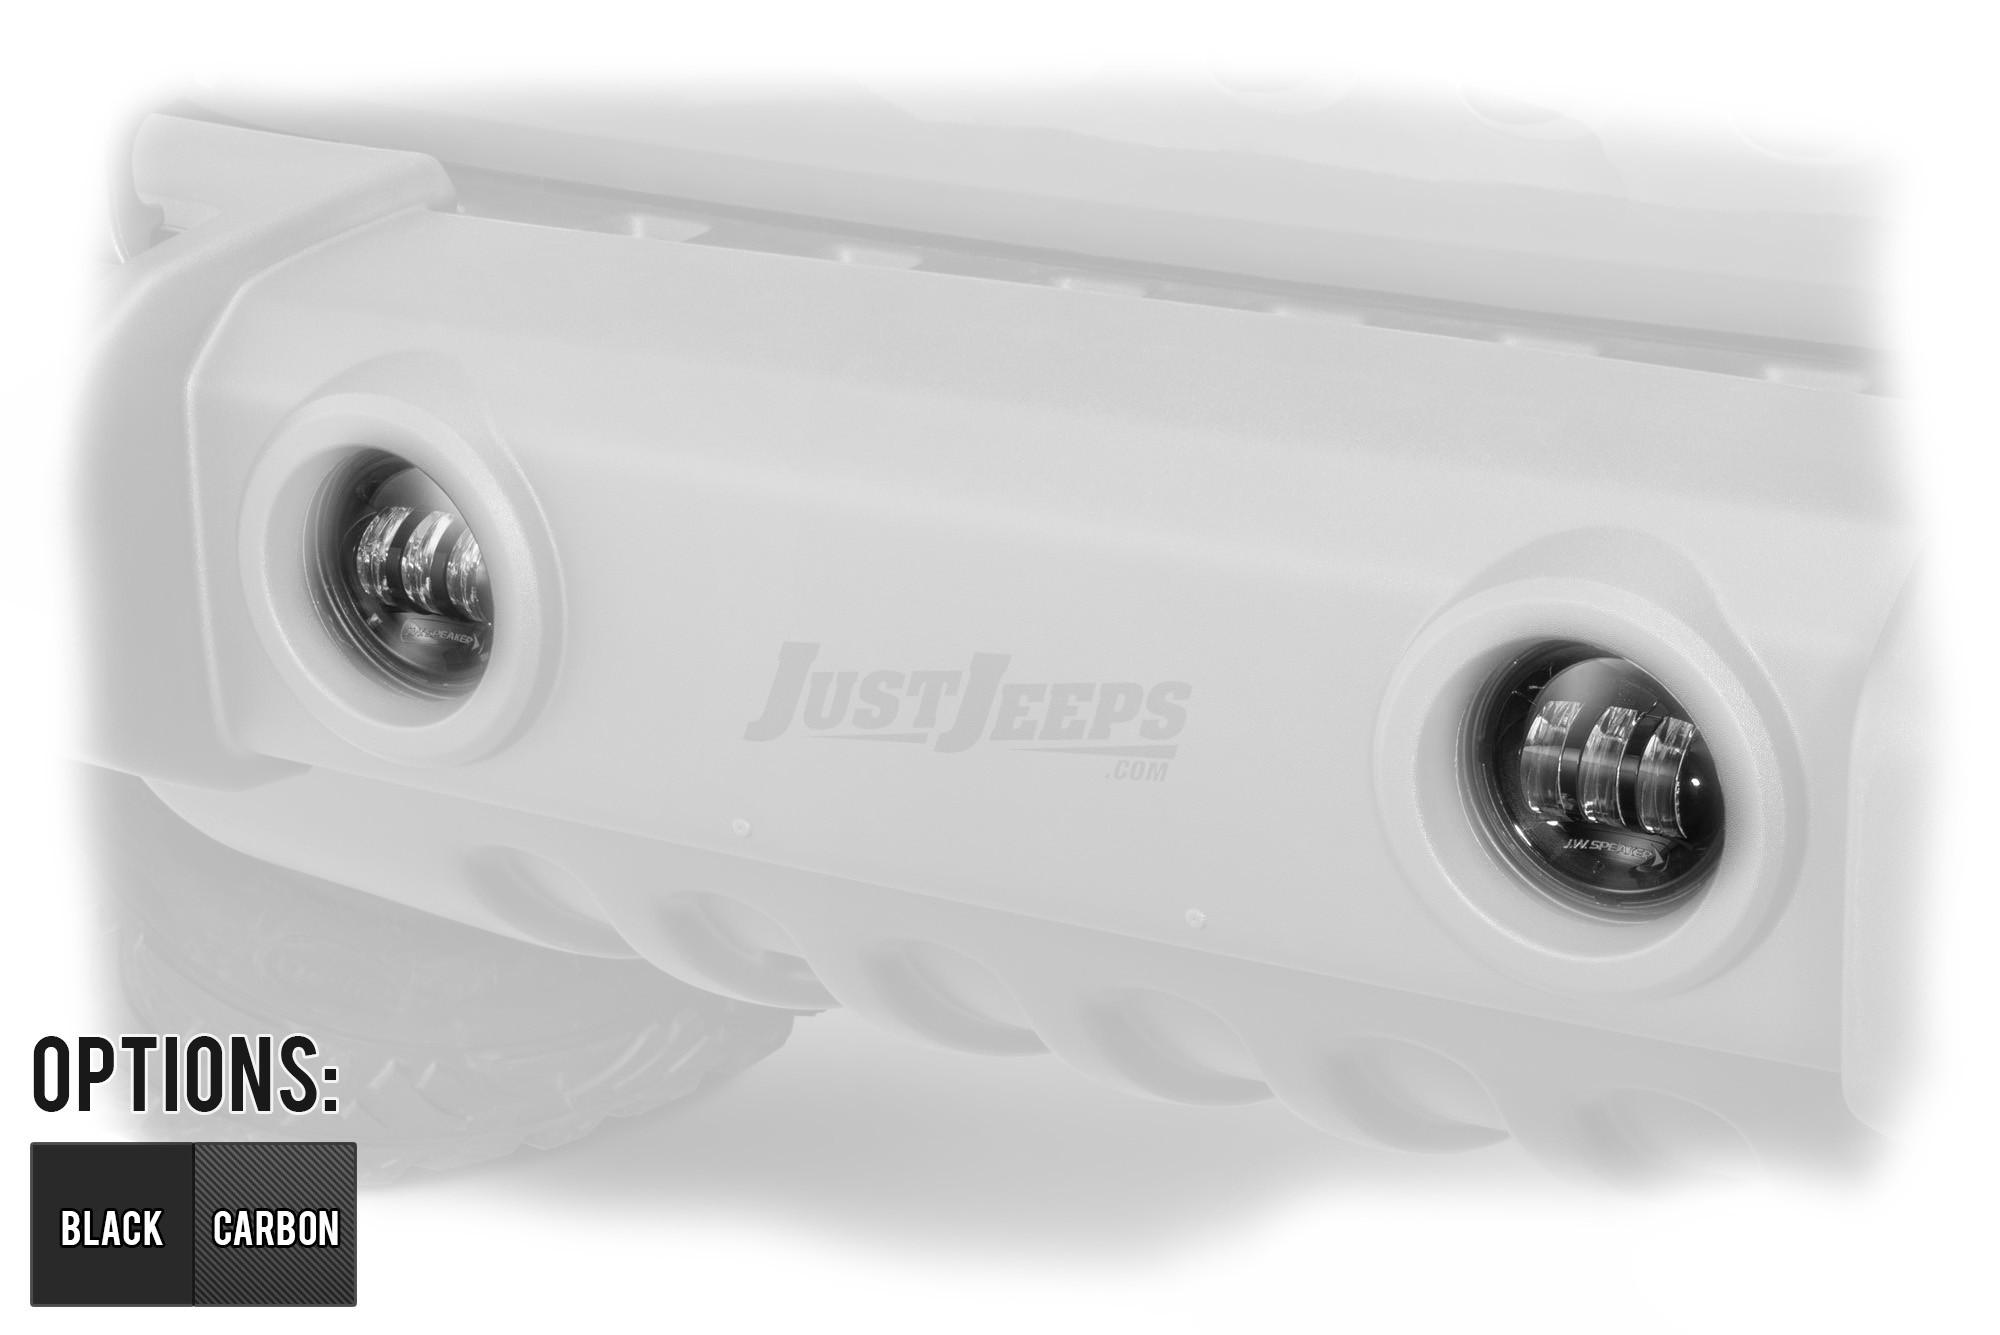 JW Speaker 6145 J2 LED Fog Lamp With Red Logo (Pair) For 2007-18 Jeep Wrangler 2 Door & Unlimited 4 Door Models